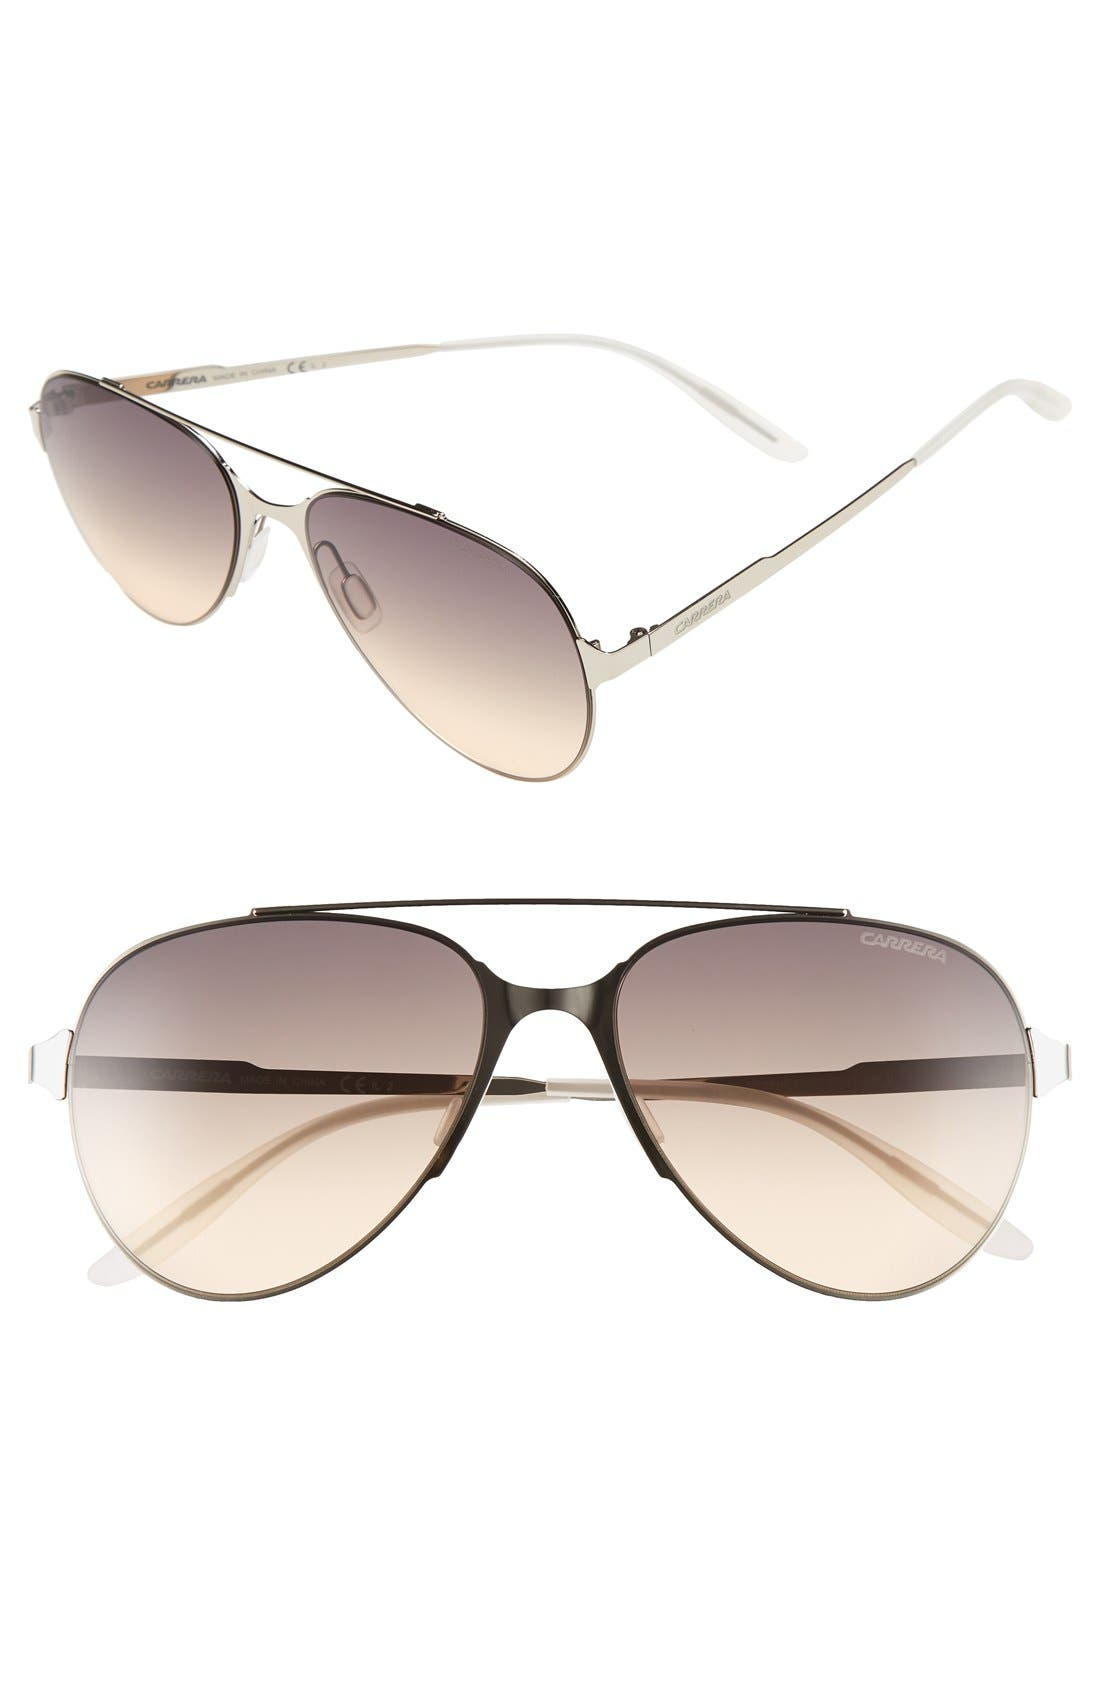 CARRERA EYEWEAR 113/S Aviator Sunglasses